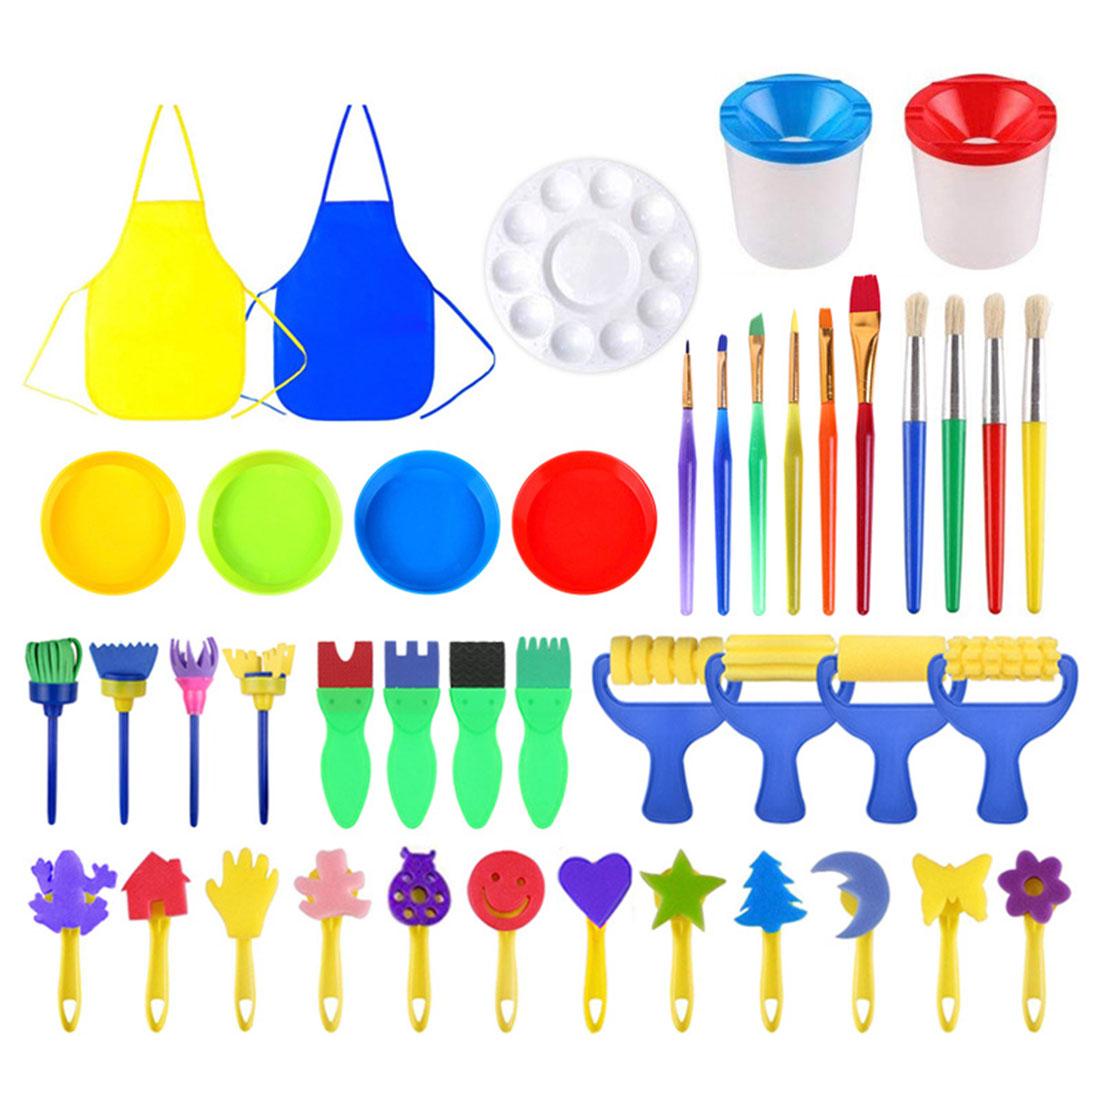 46pcs/set DIY Kids Painting Tools Sponge Paint Roller Brushes Kids Drawing Toys Children Early Learning Toys Art Graffiti Tool